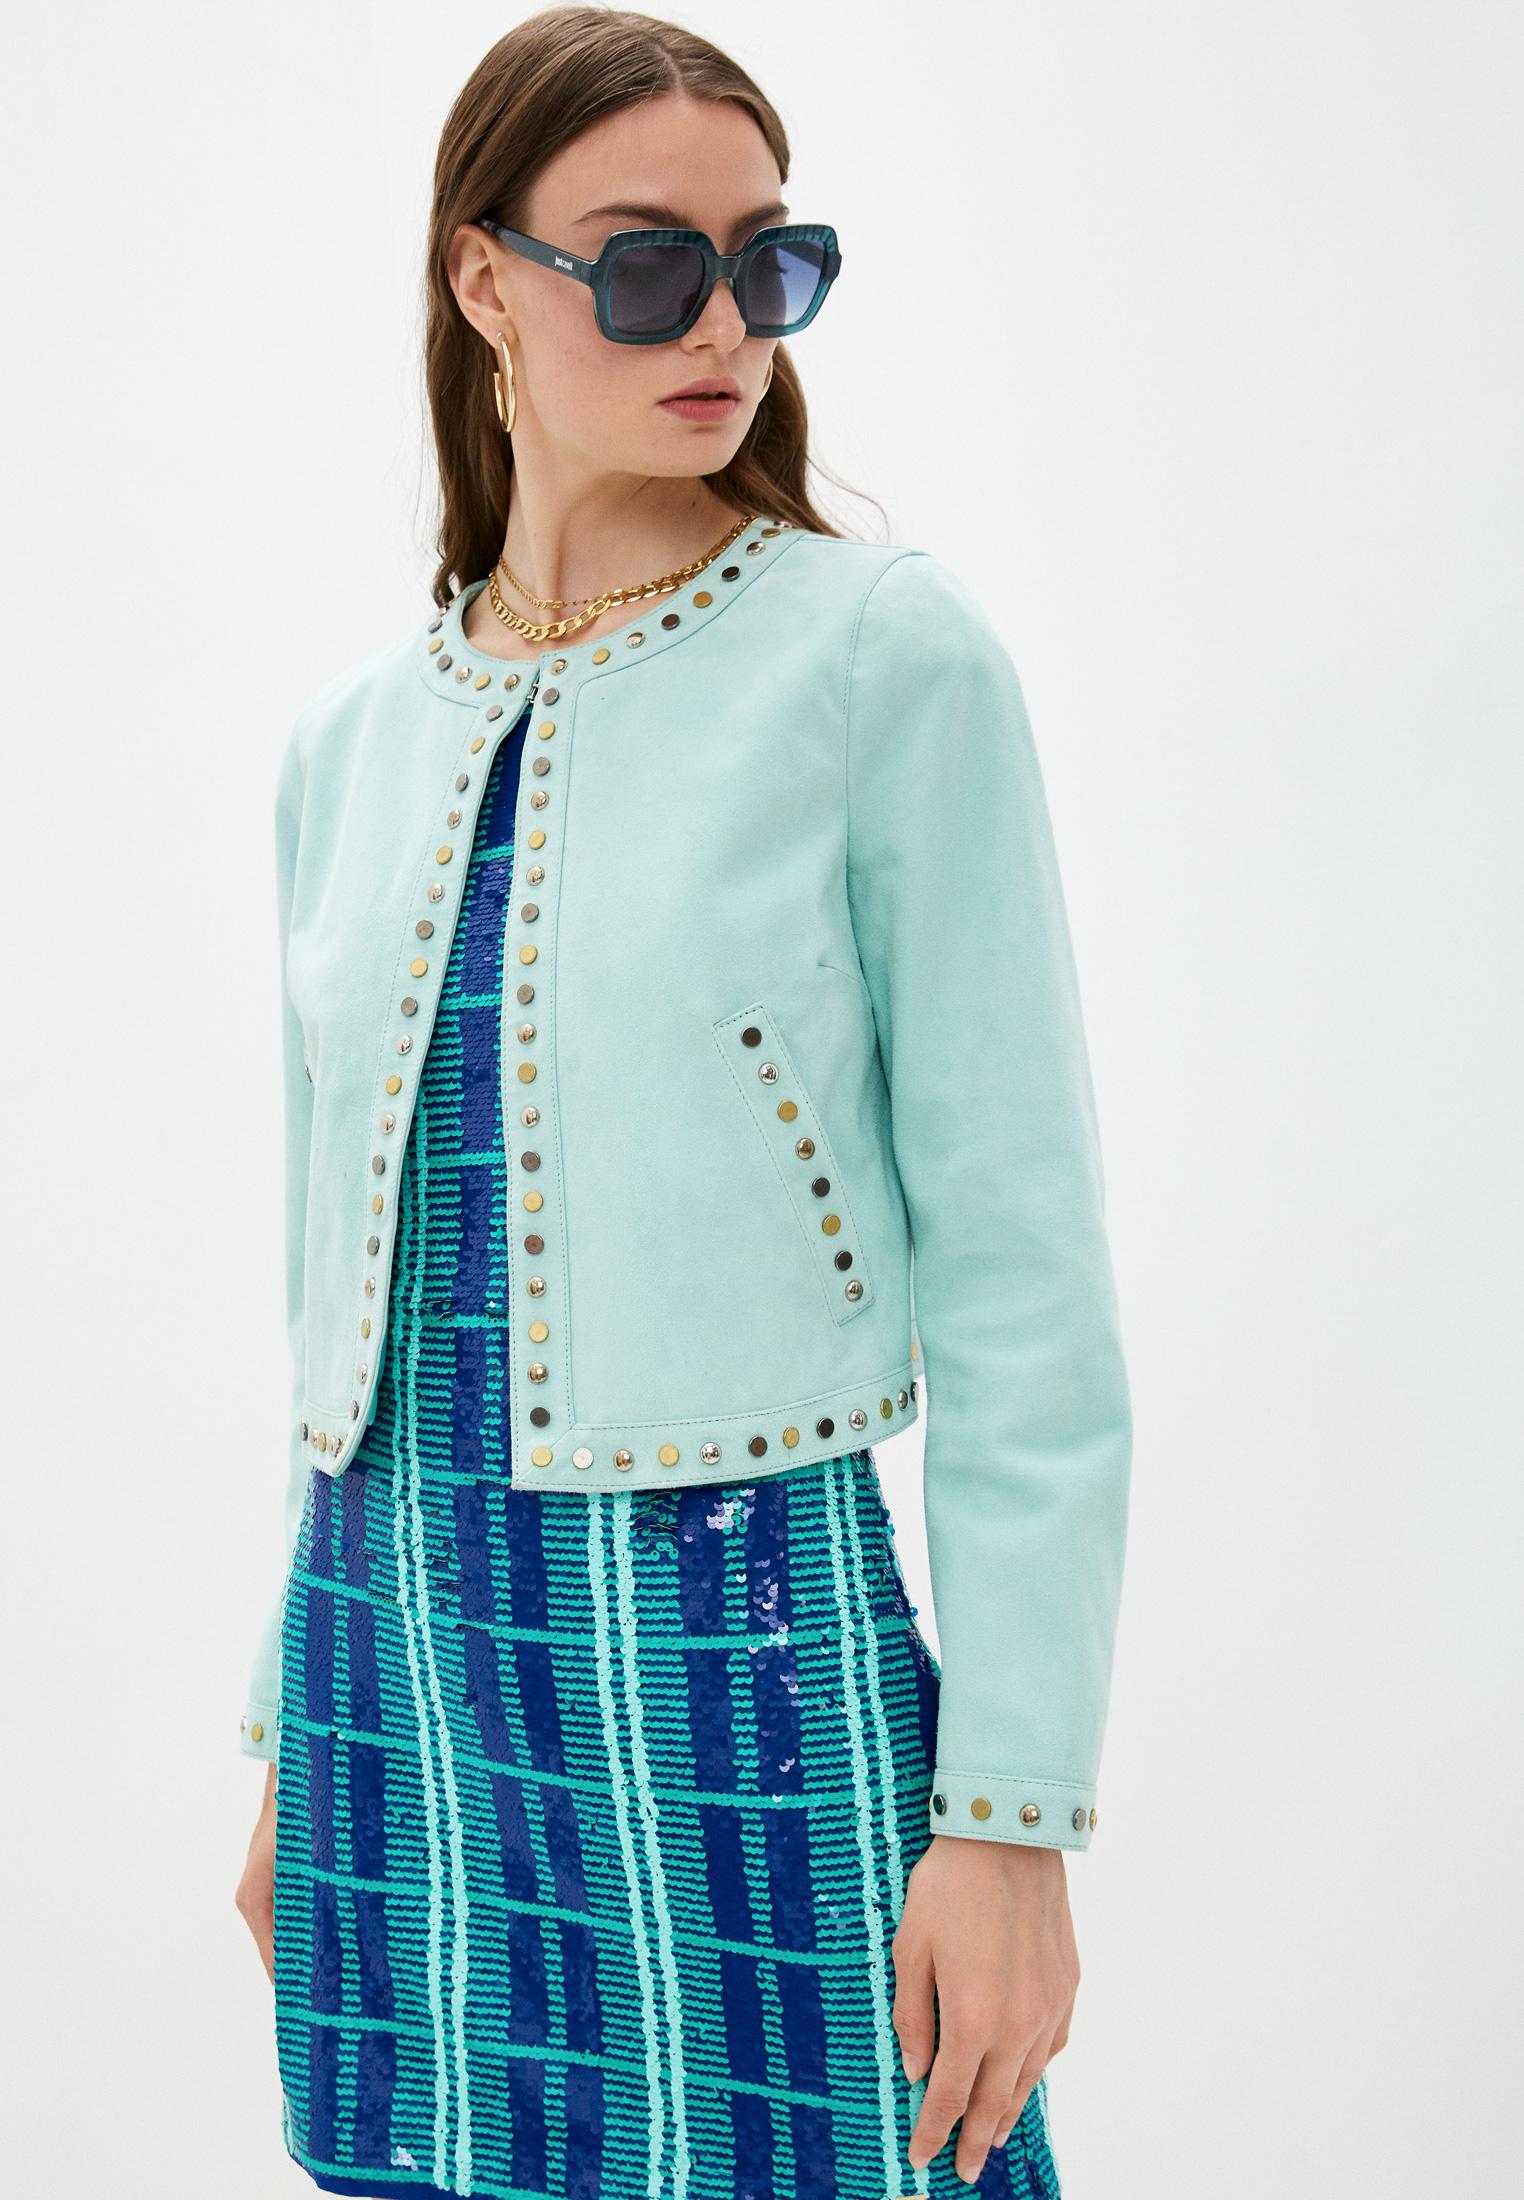 Кожаная куртка Just Cavalli (Джаст Кавалли) Куртка кожаная Just Cavalli